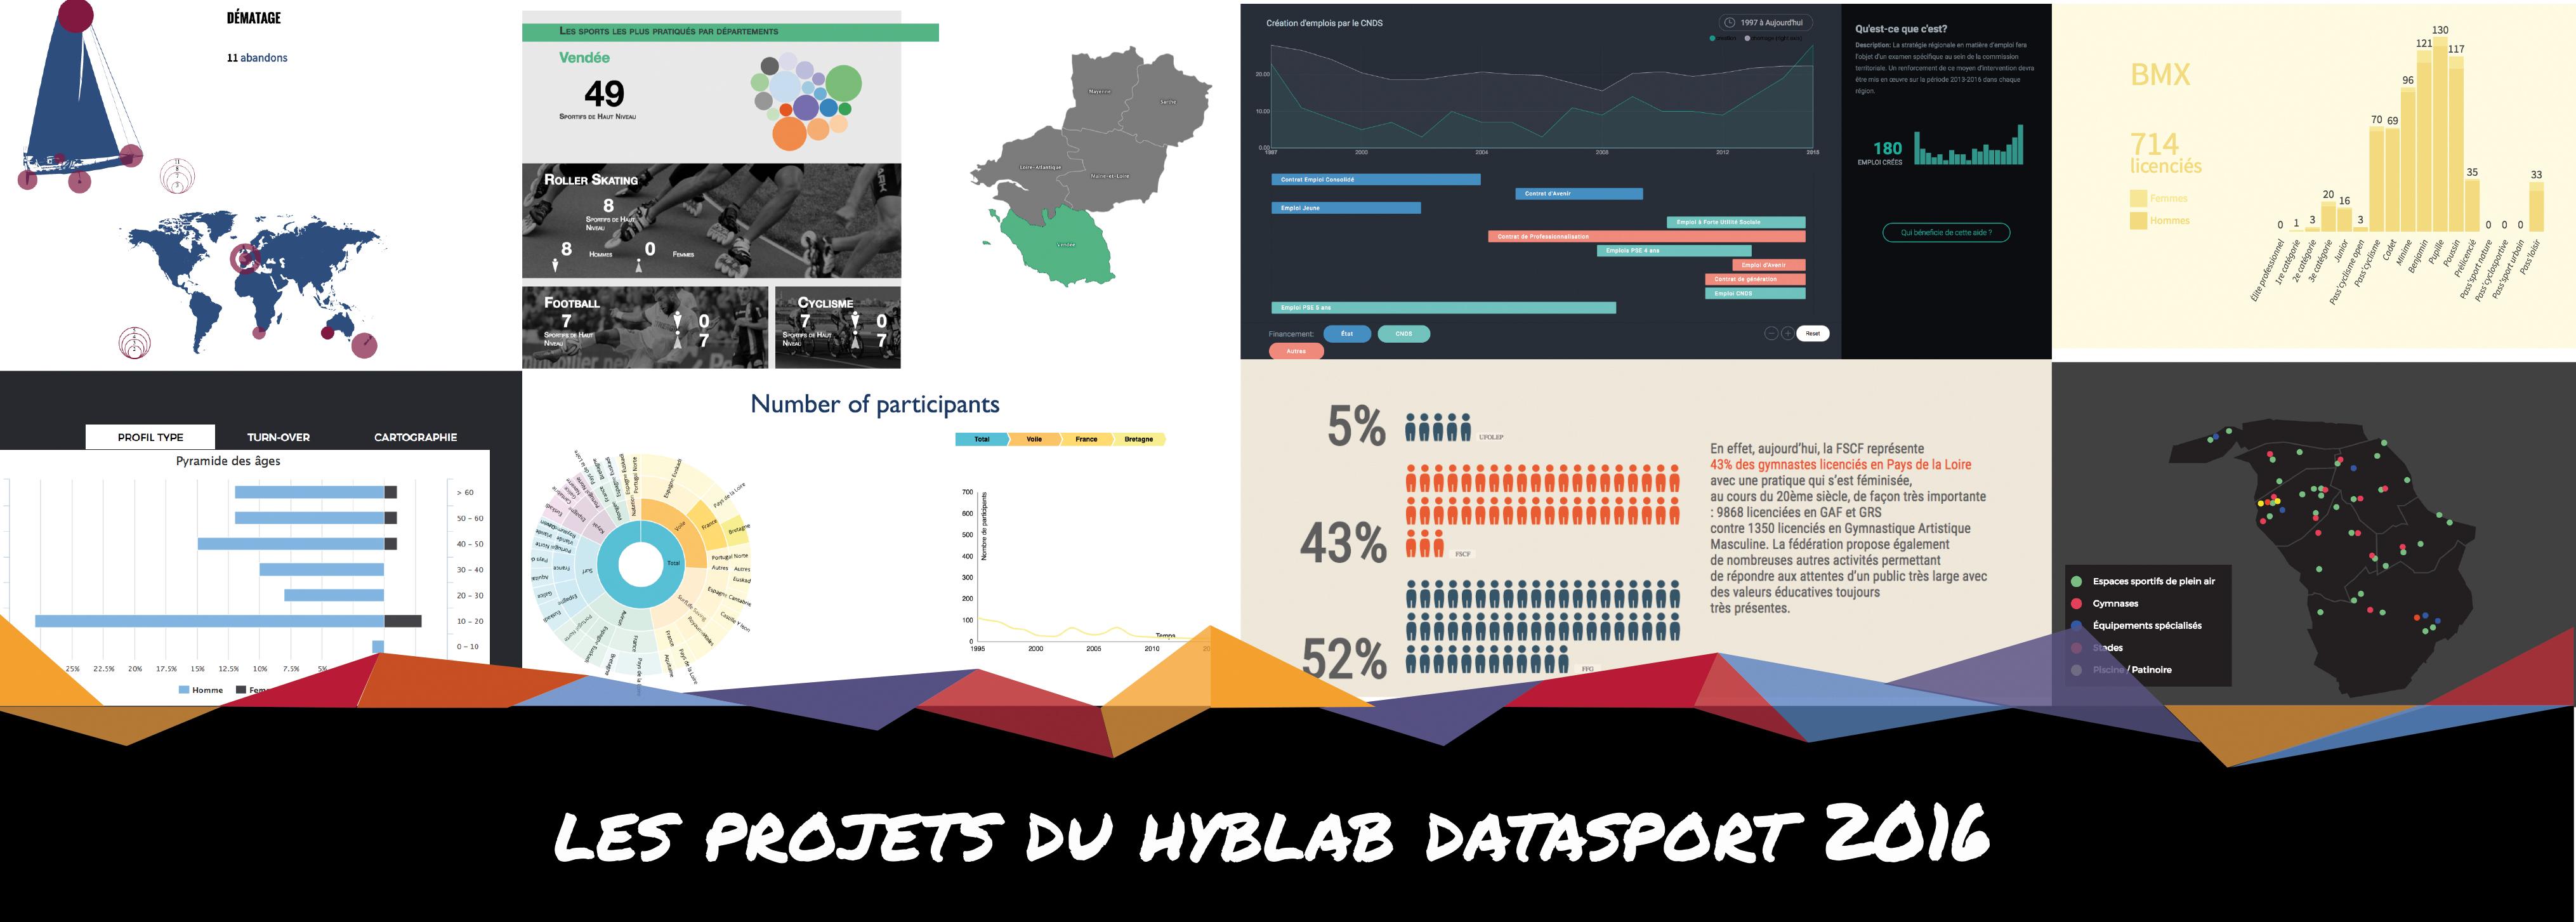 Projets-datasport-2016